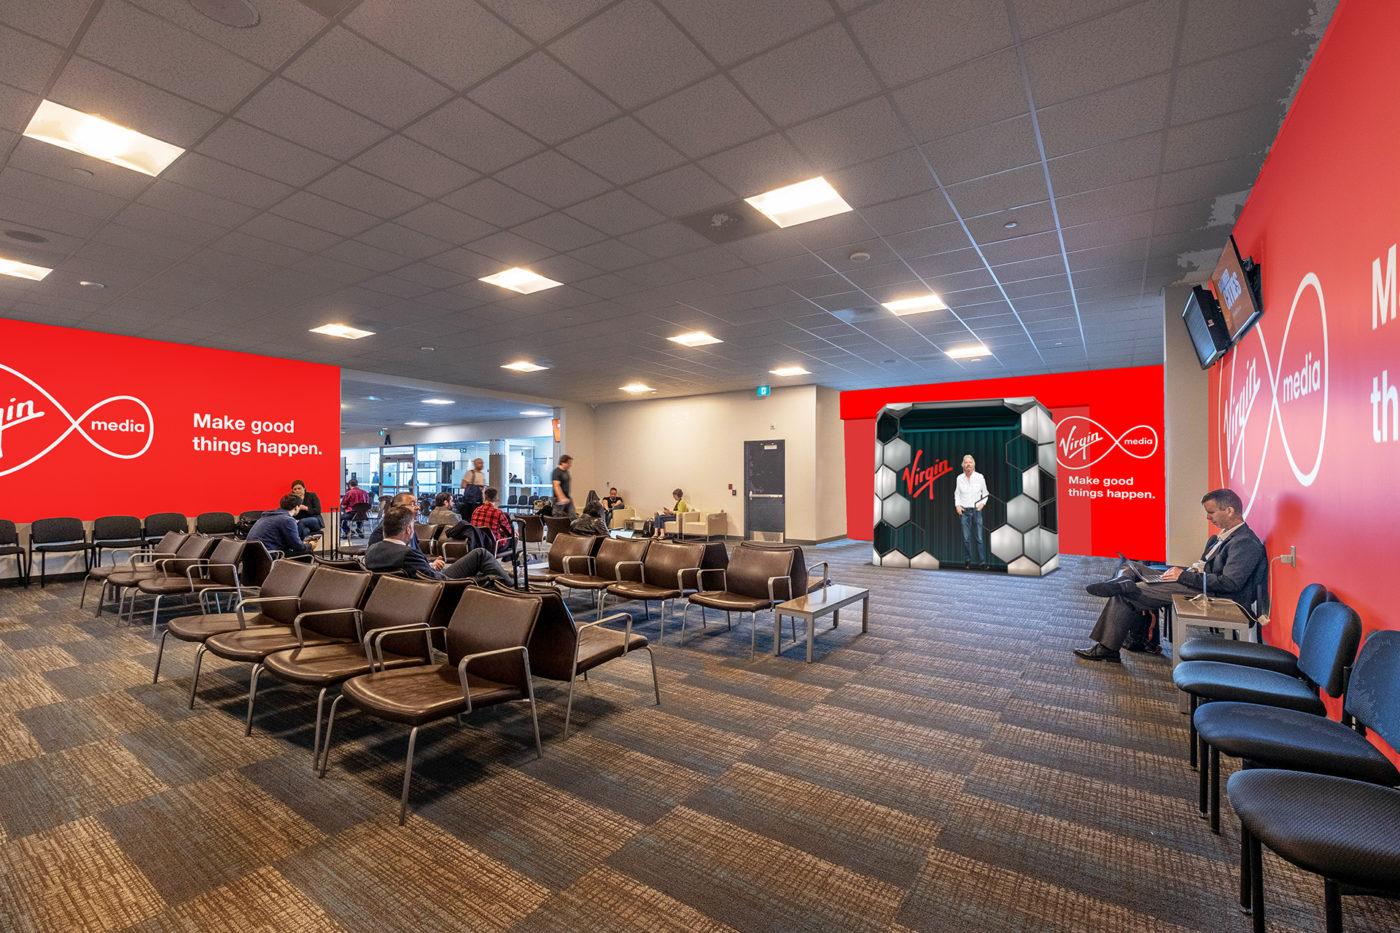 Virgin Media - Billy Bishop Toronto City Airport - Departures - Hologram Activation (Toronto, Ontario)